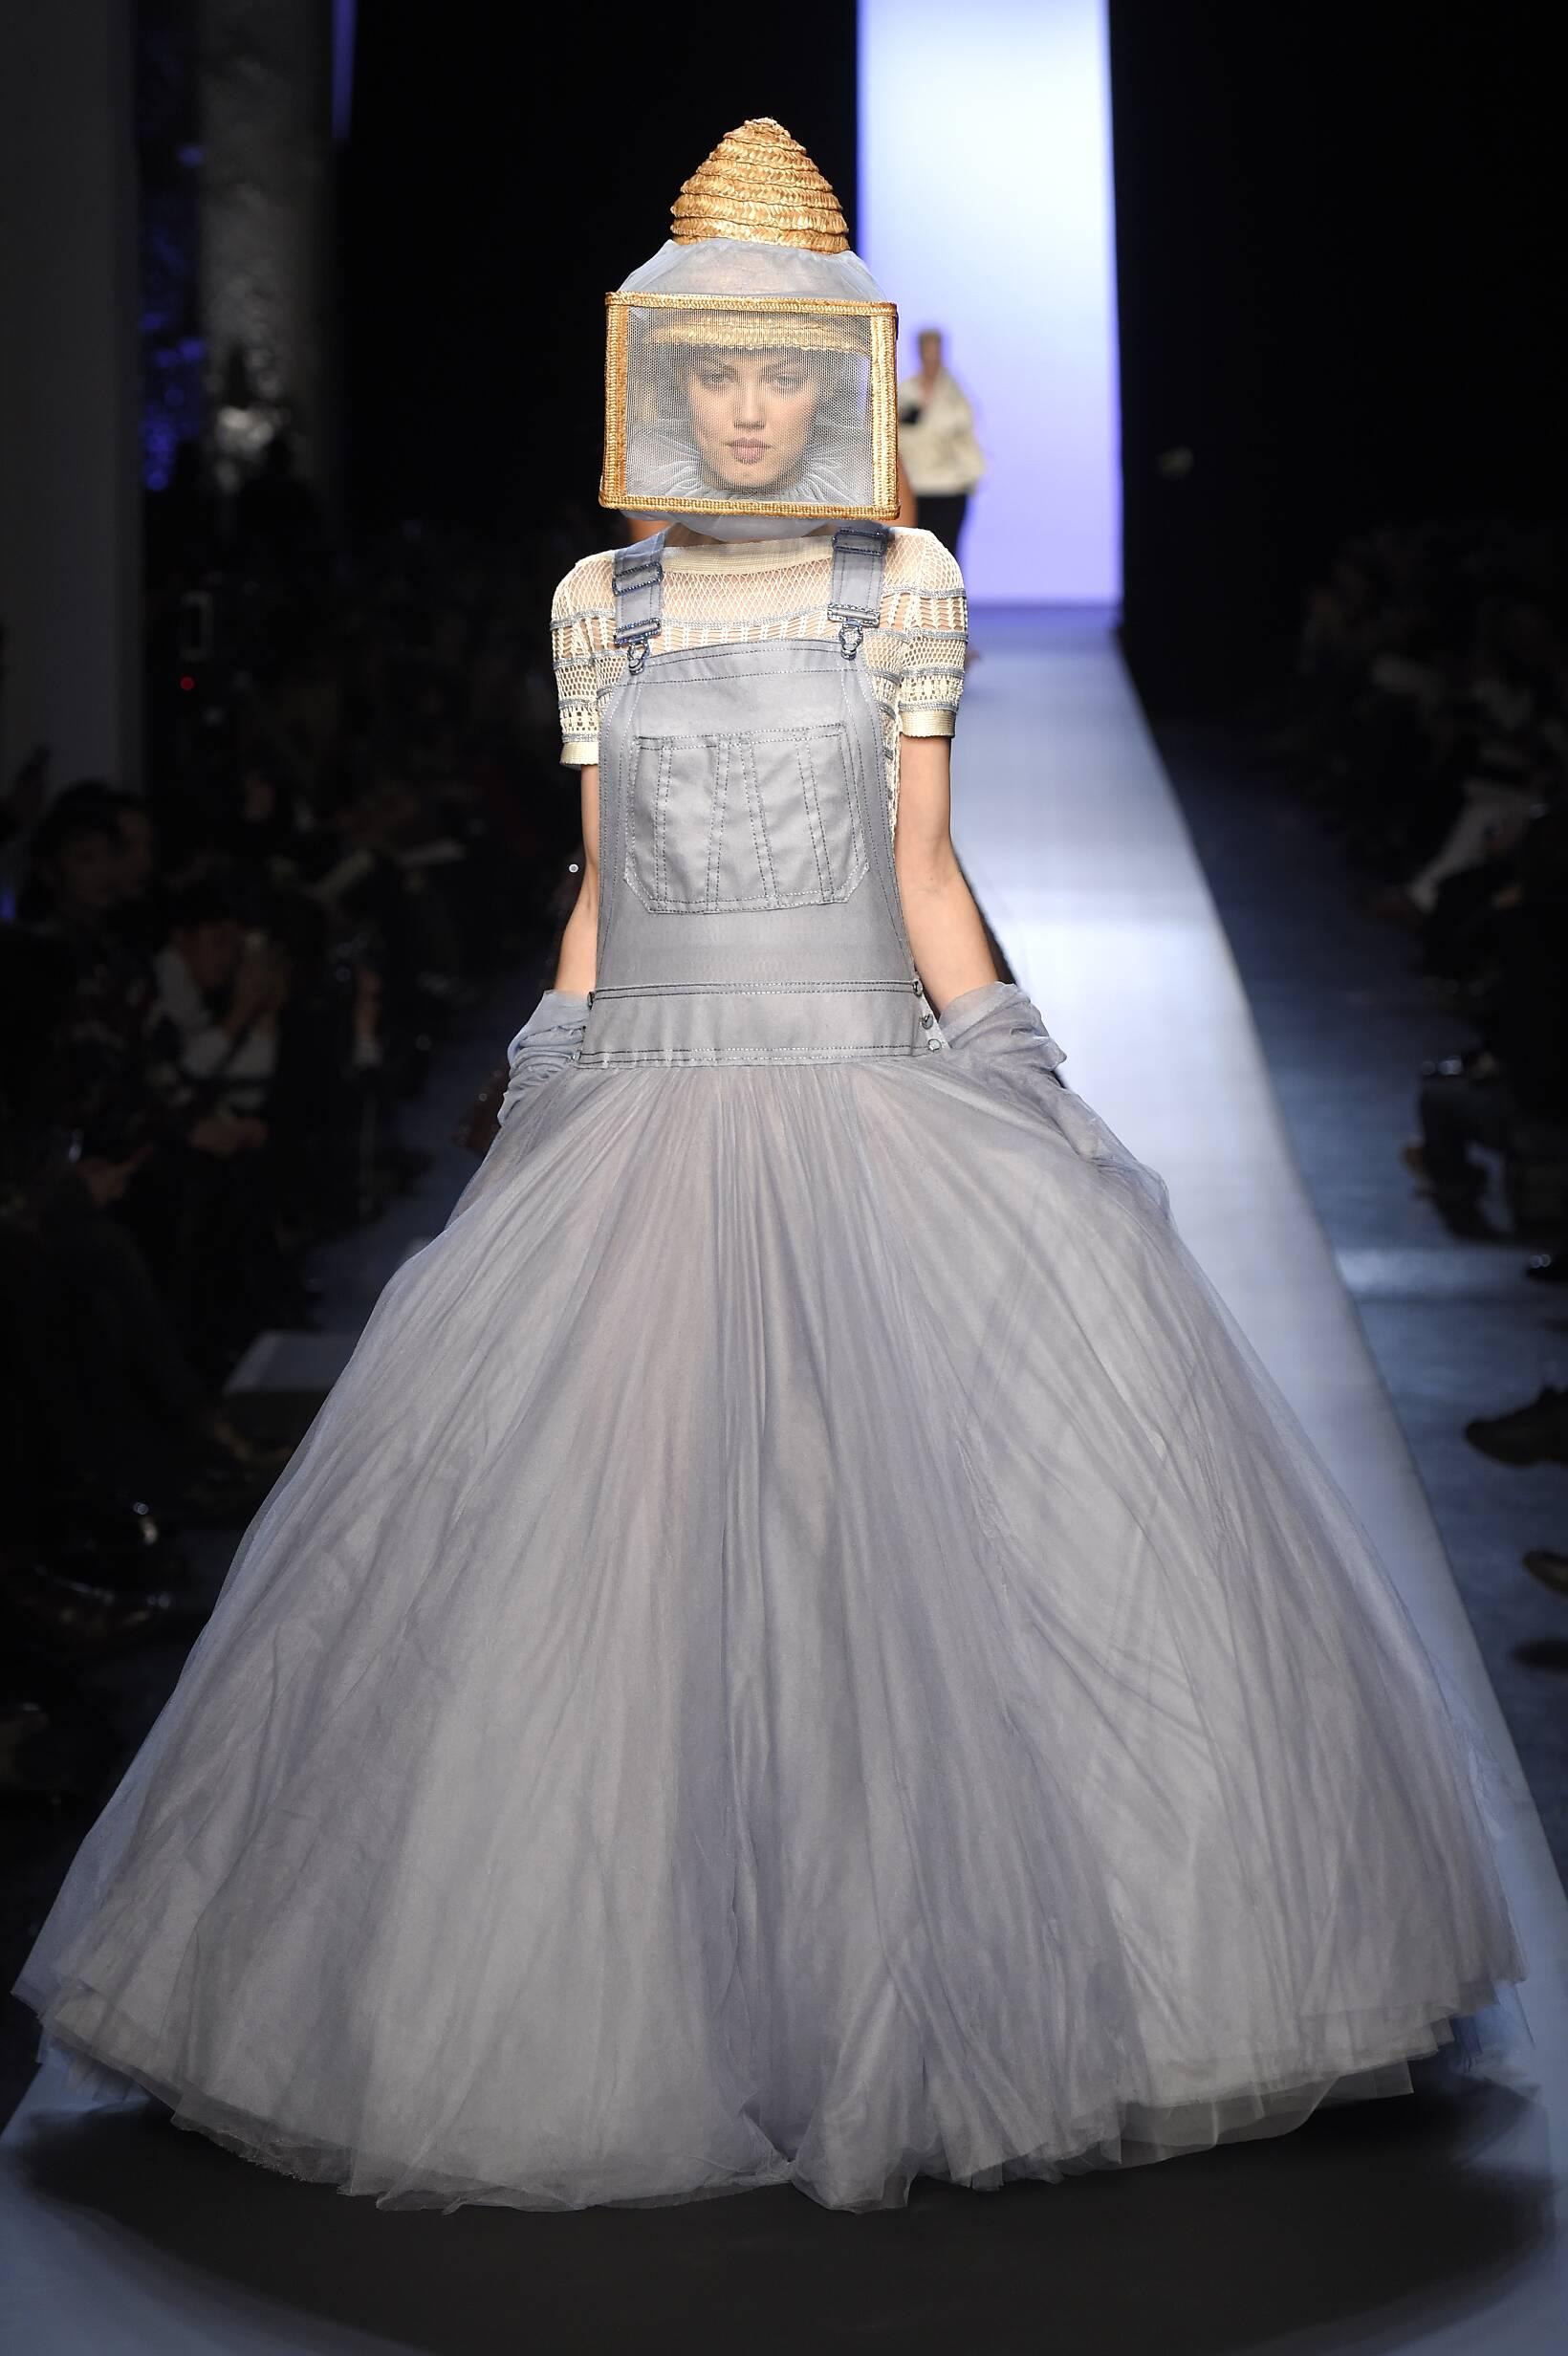 Catwalk Jean Paul Gaultier Haute Couture Collection Fashion Show Summer 2015